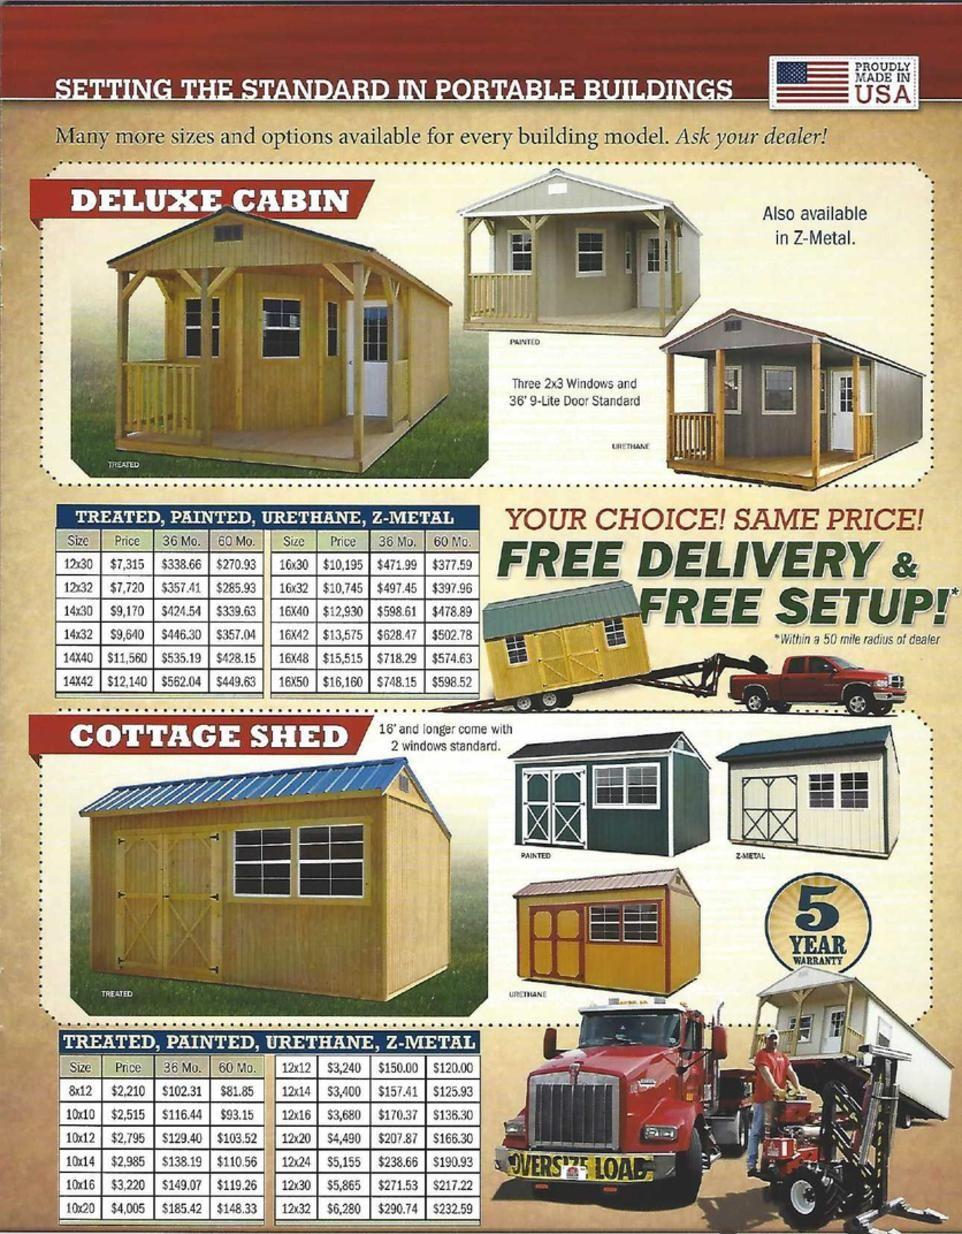 Lafayette Portable Buildings is based in Louisiana. We ...